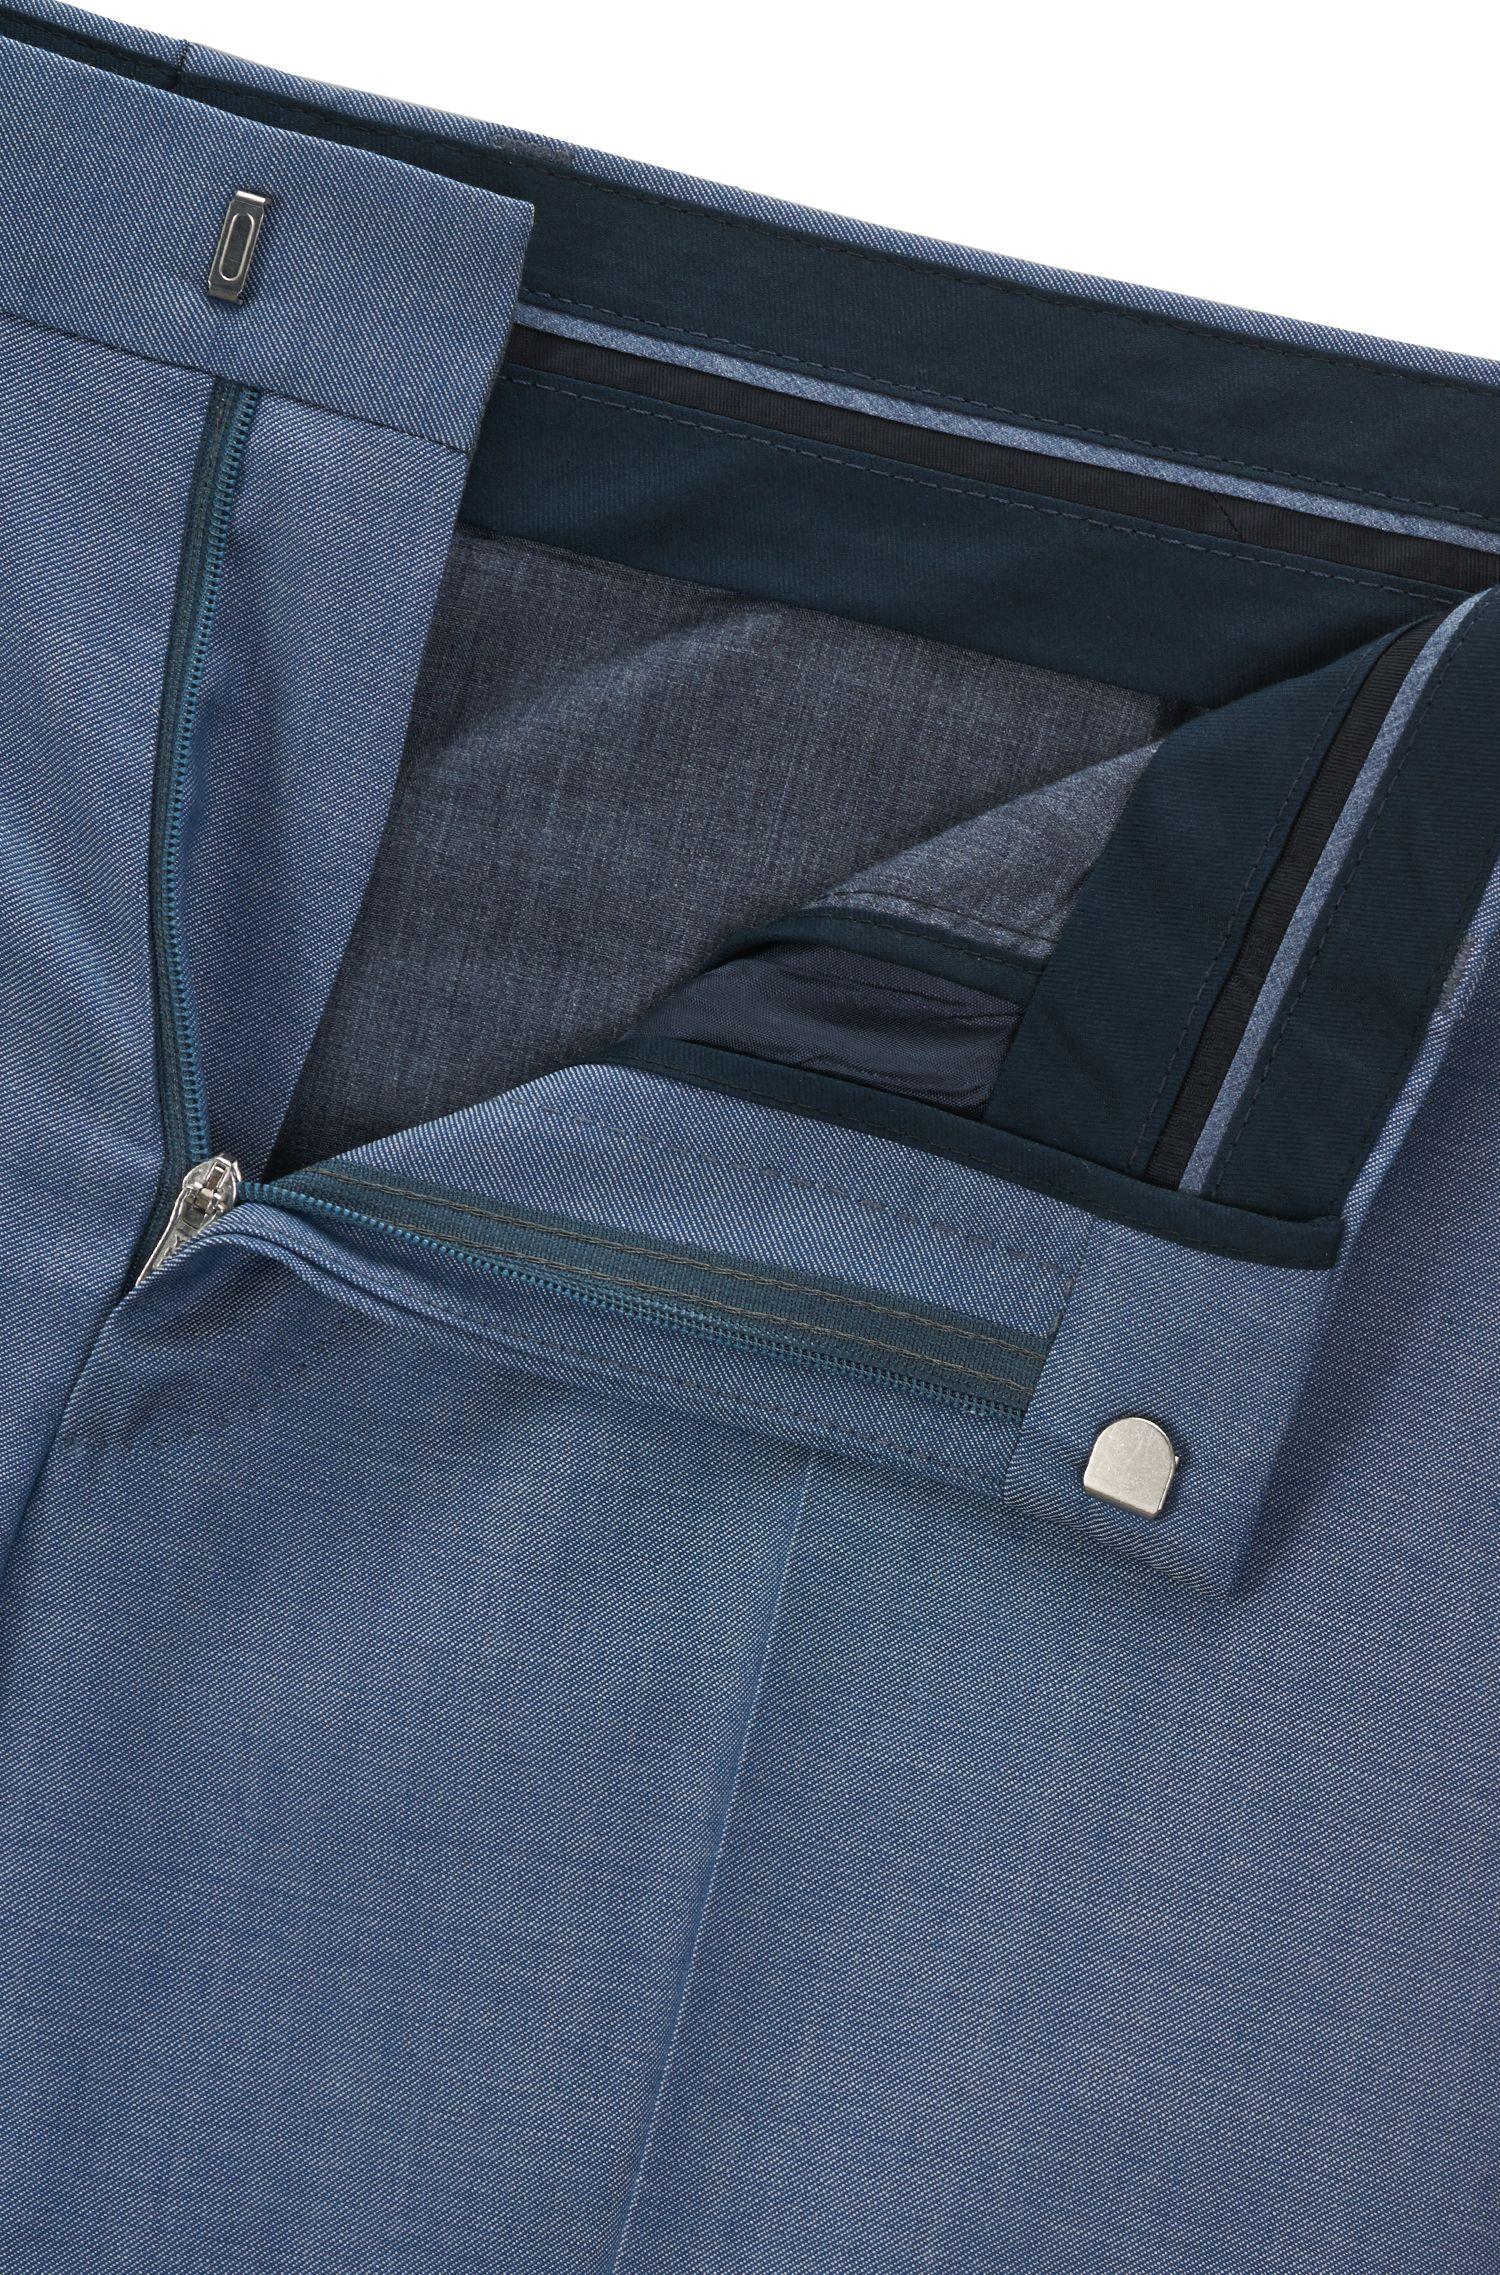 Pantaloni slim fit in lana vergine effetto mohair